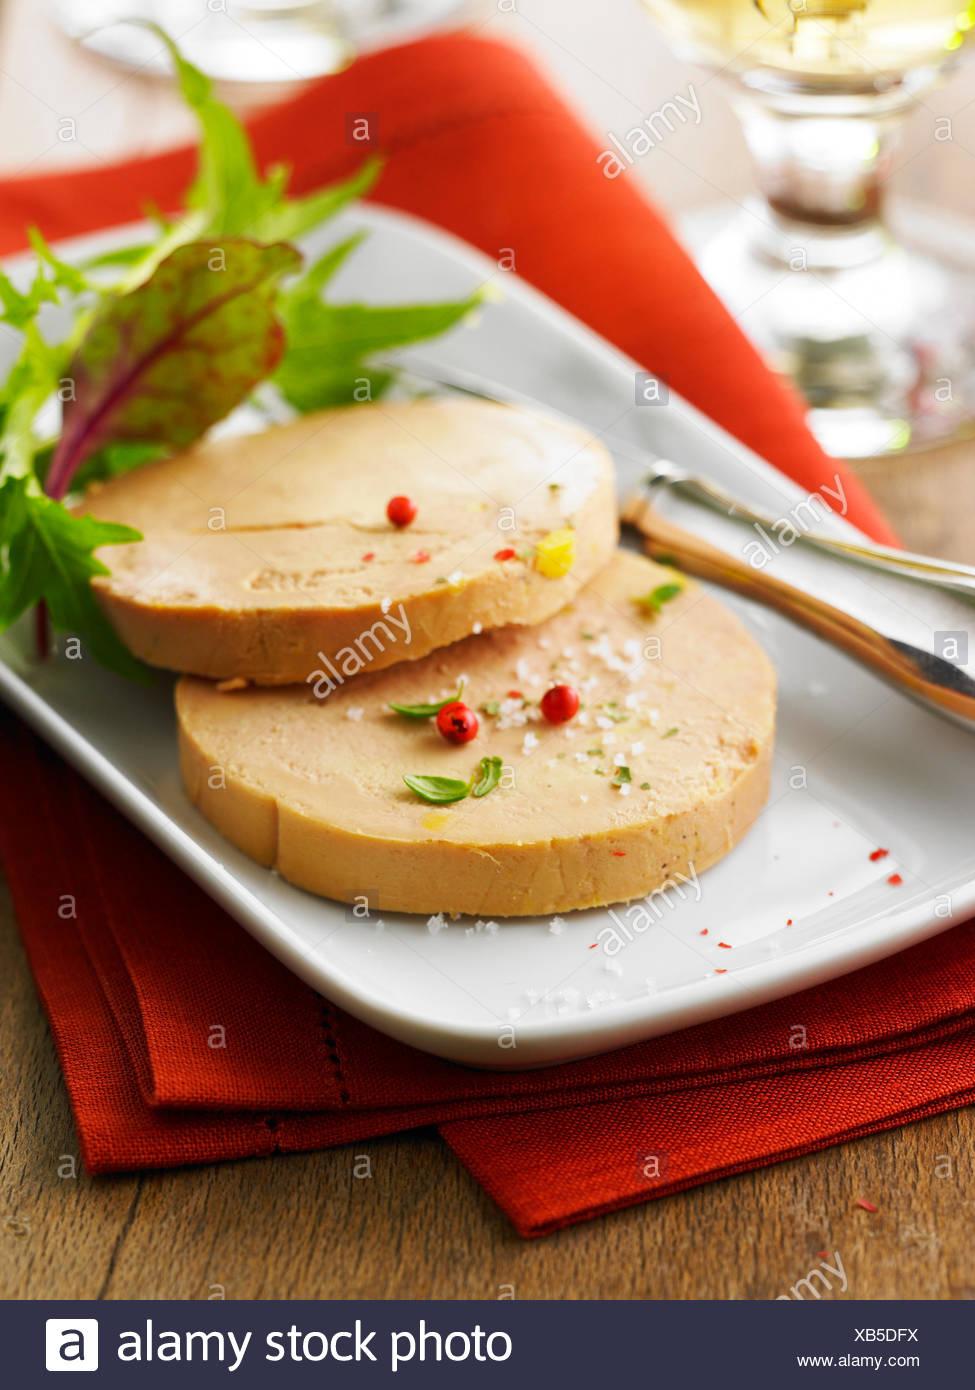 Slices of foie gras - Stock Image